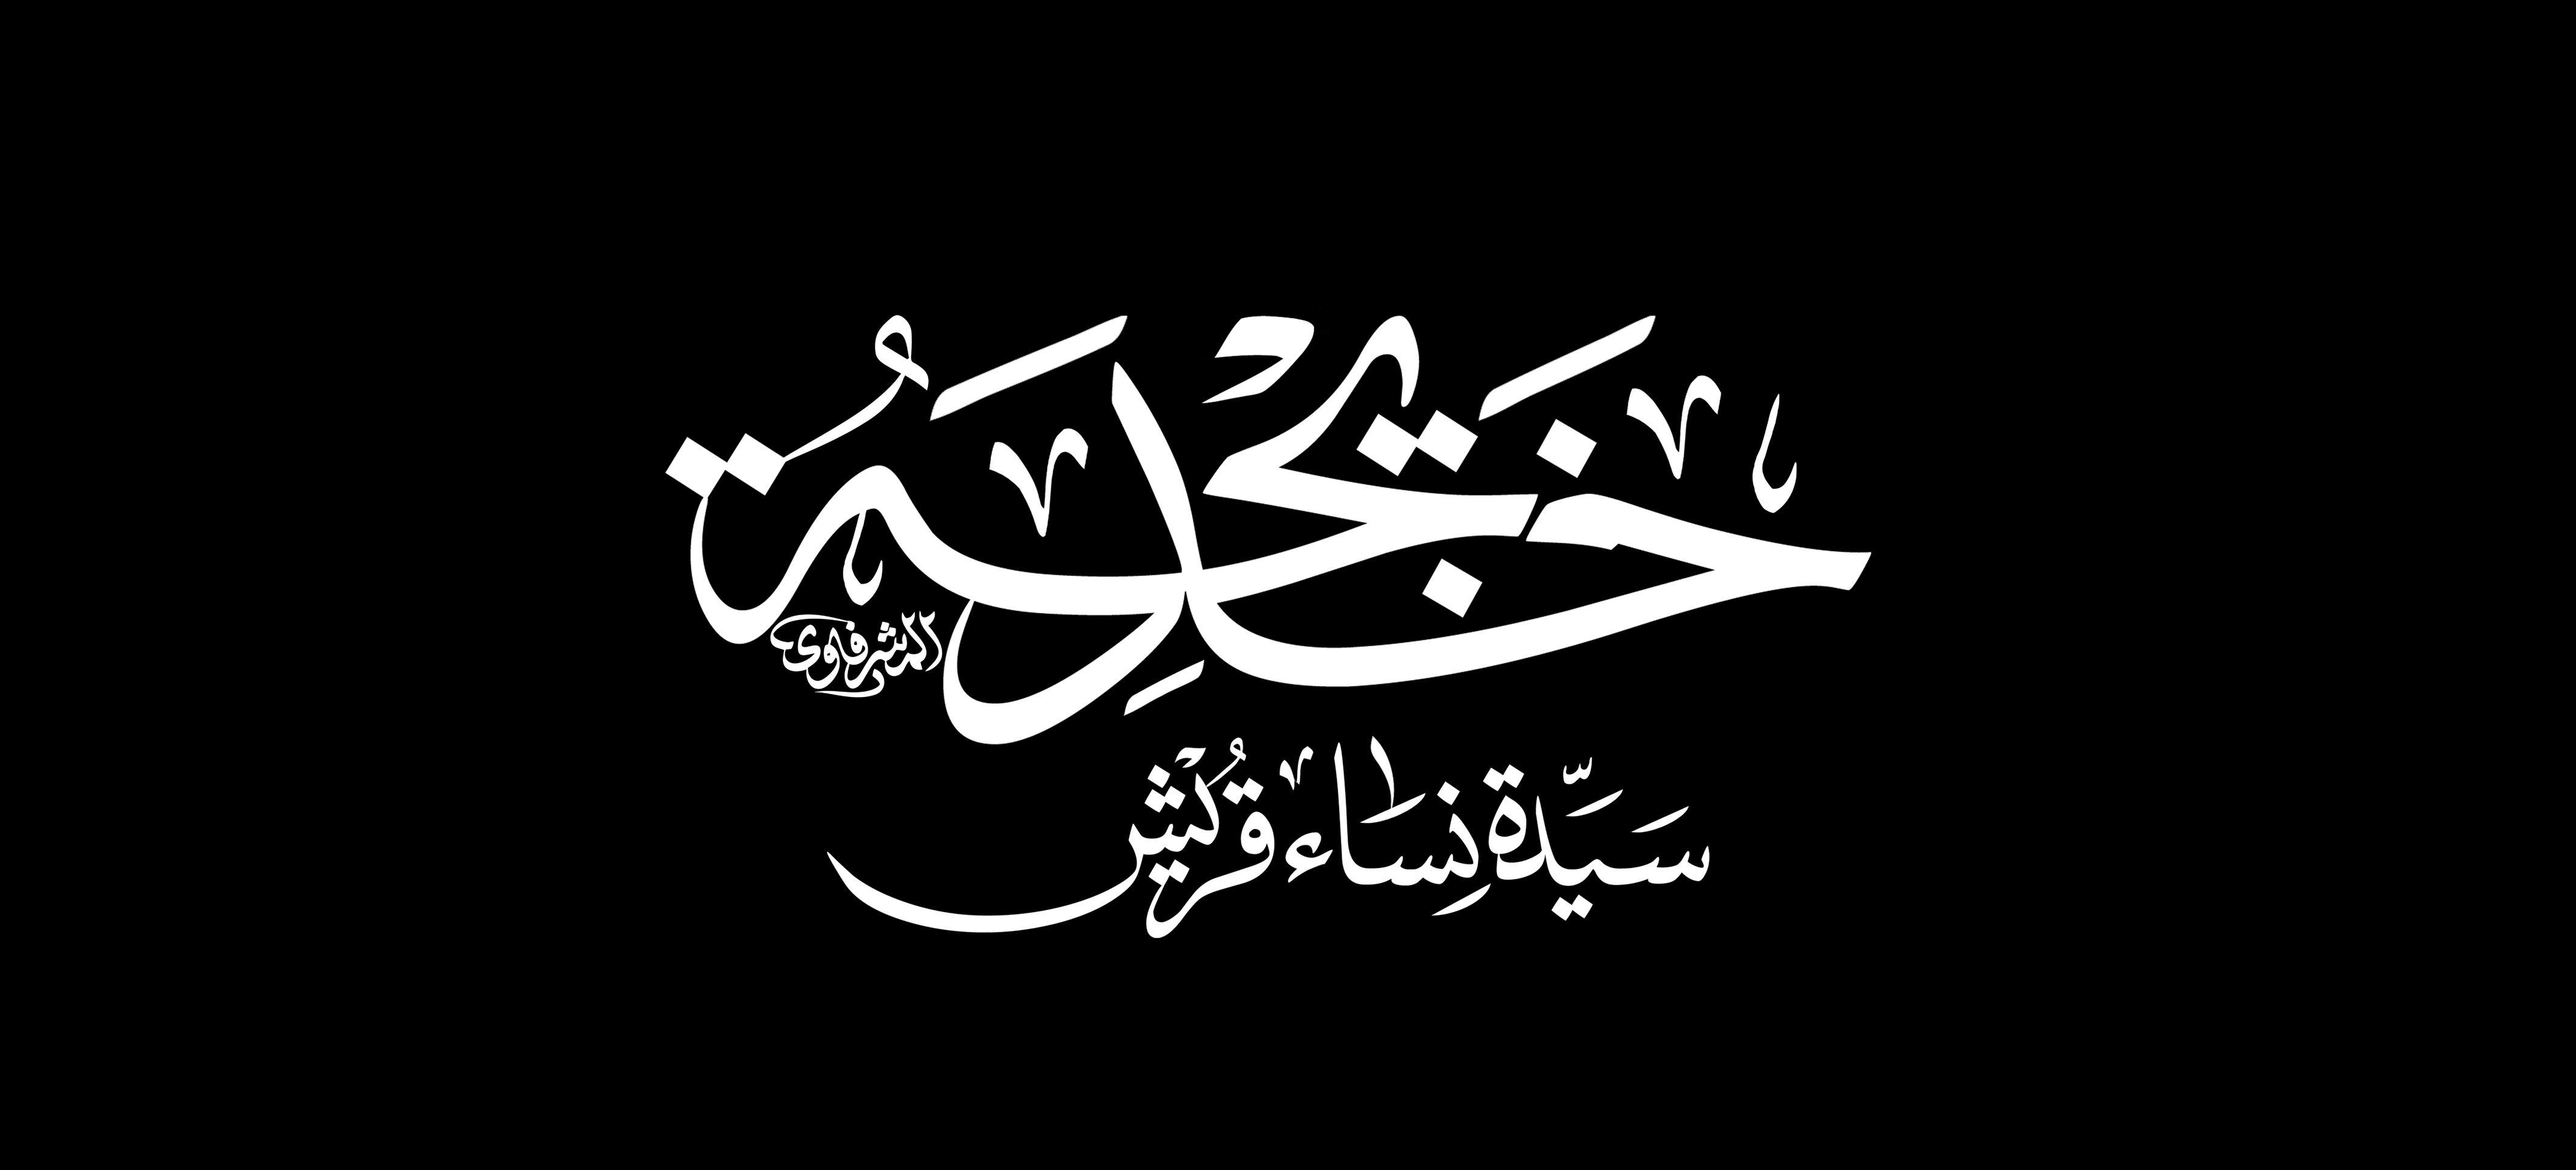 ماريا القبطيه Islamic Inspirational Quotes Islam Facts Learn Islam